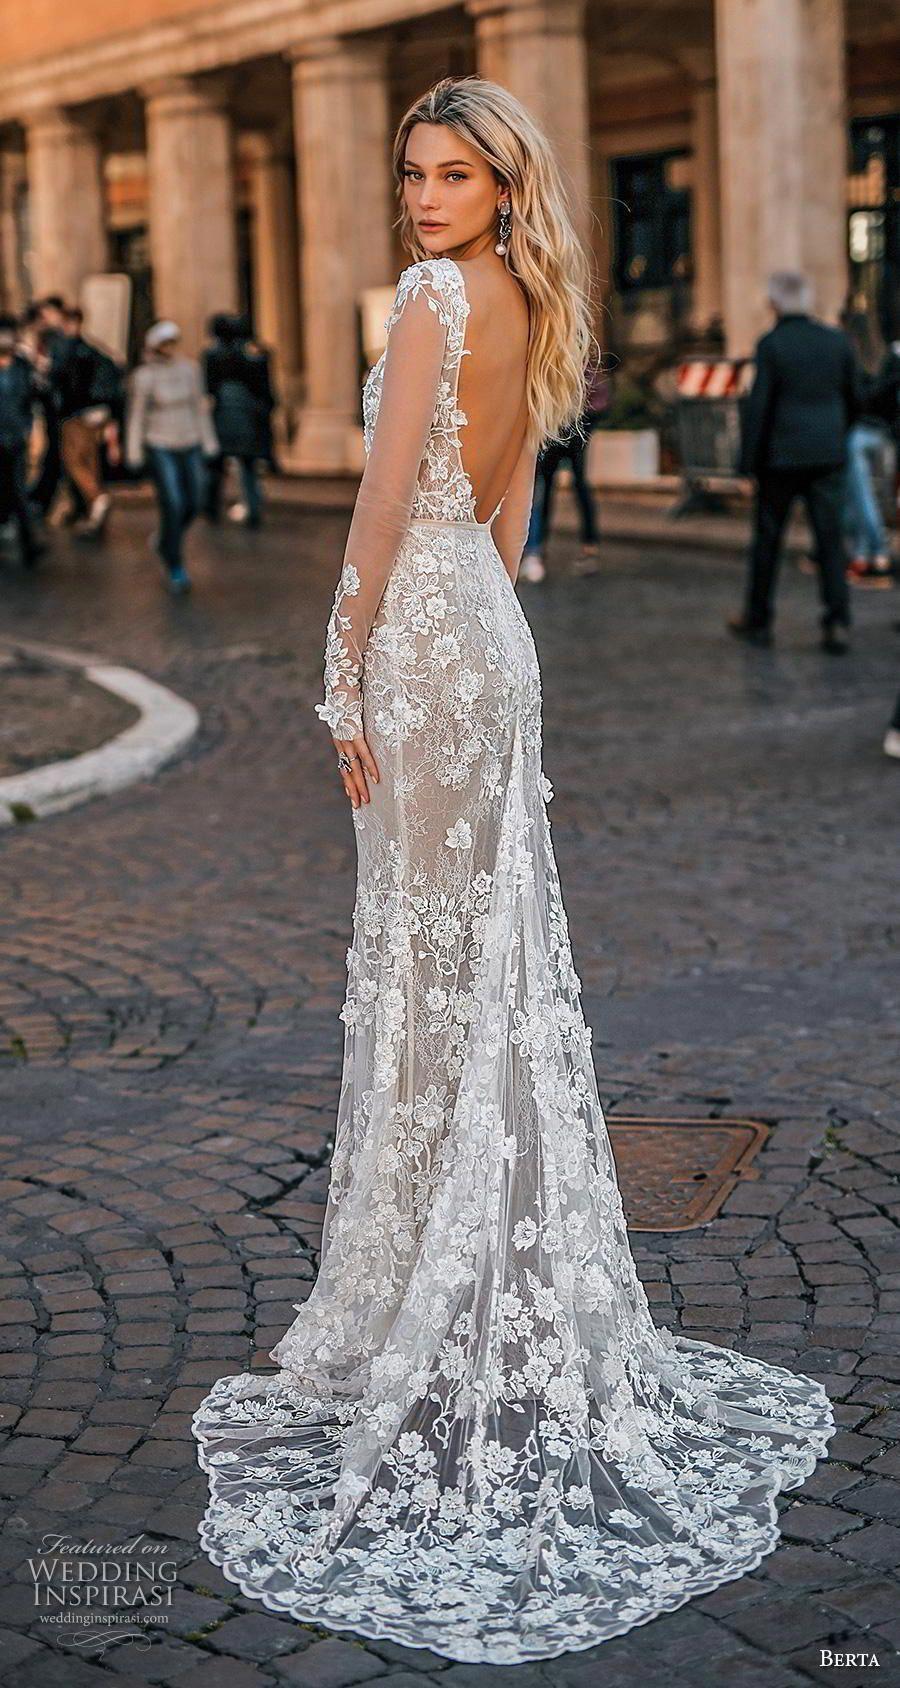 Berta 2020 Privee Bridal Long Sleeves Deep V Neck Full Embellishment Elegant F Long Sleeve Bridal Gown Wedding Dress Sleeves Long Sleeve Wedding Dress Backless [ 1688 x 900 Pixel ]